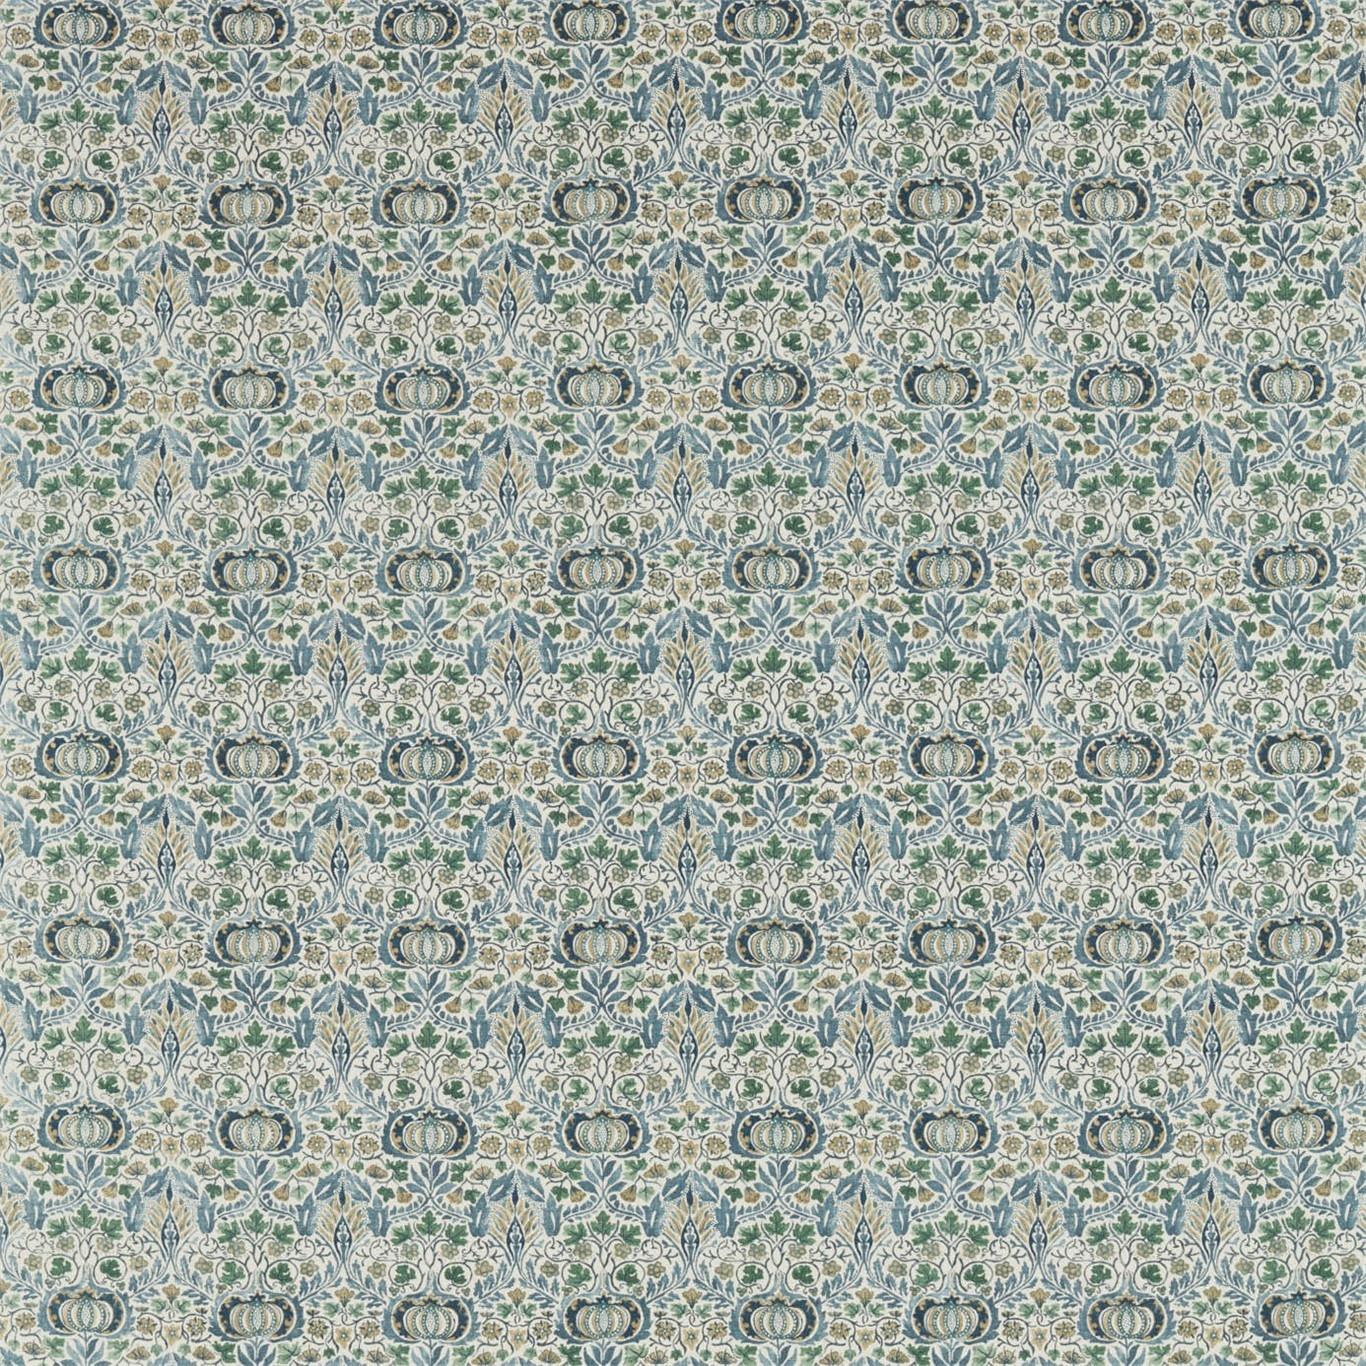 Image of Morris & Co Little Chintz Blue/Fennel Fabric 226406